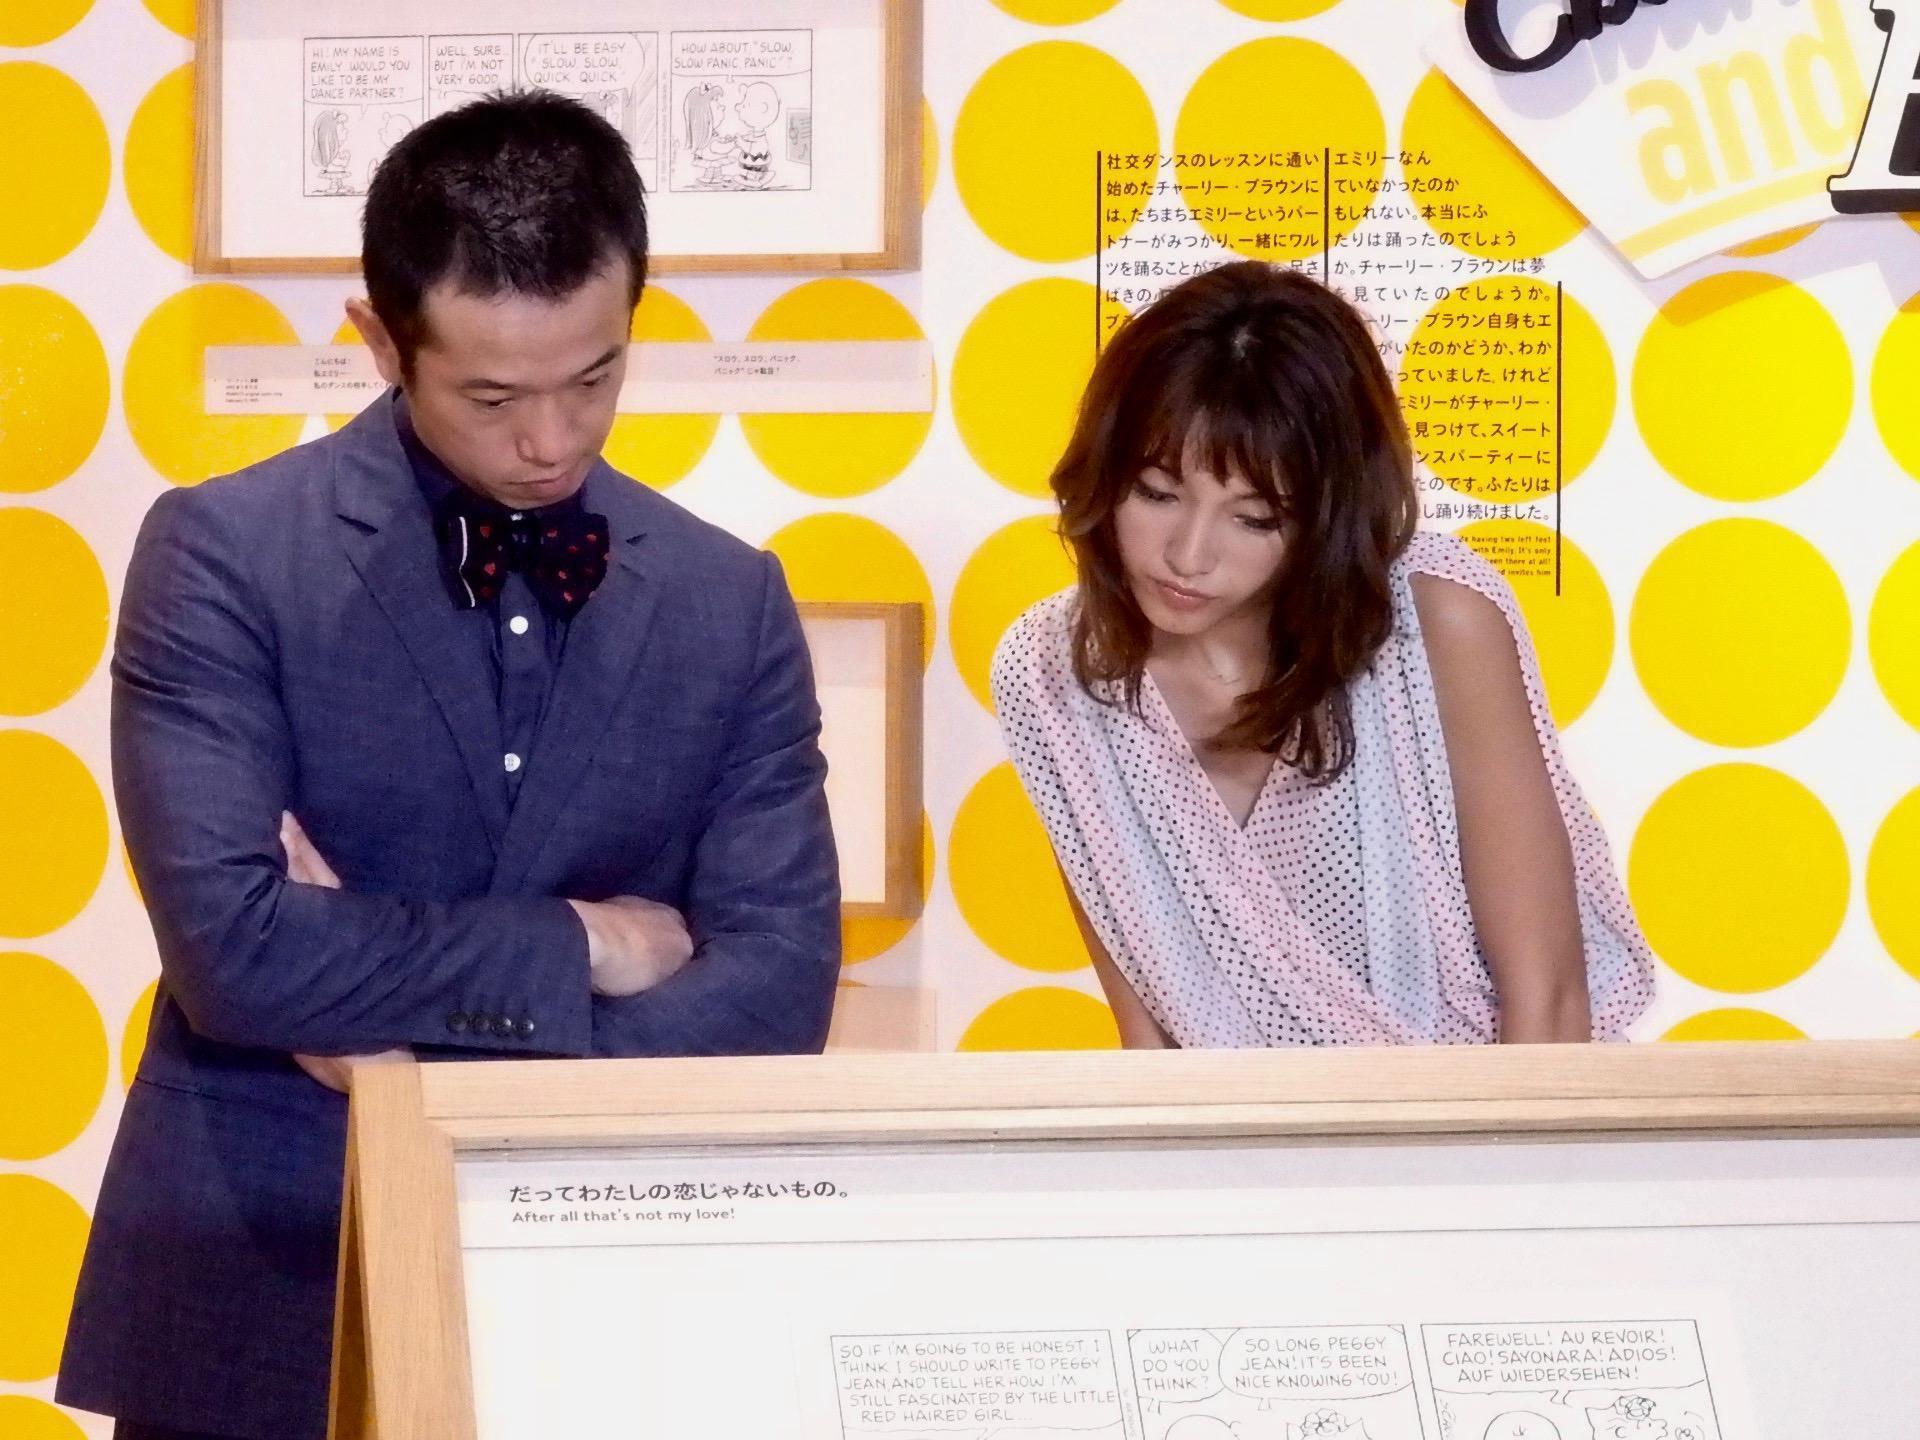 http://news.yoshimoto.co.jp/20180206180928-ae467faa209319fca65ce6b37a1c15134e0d3708.jpg